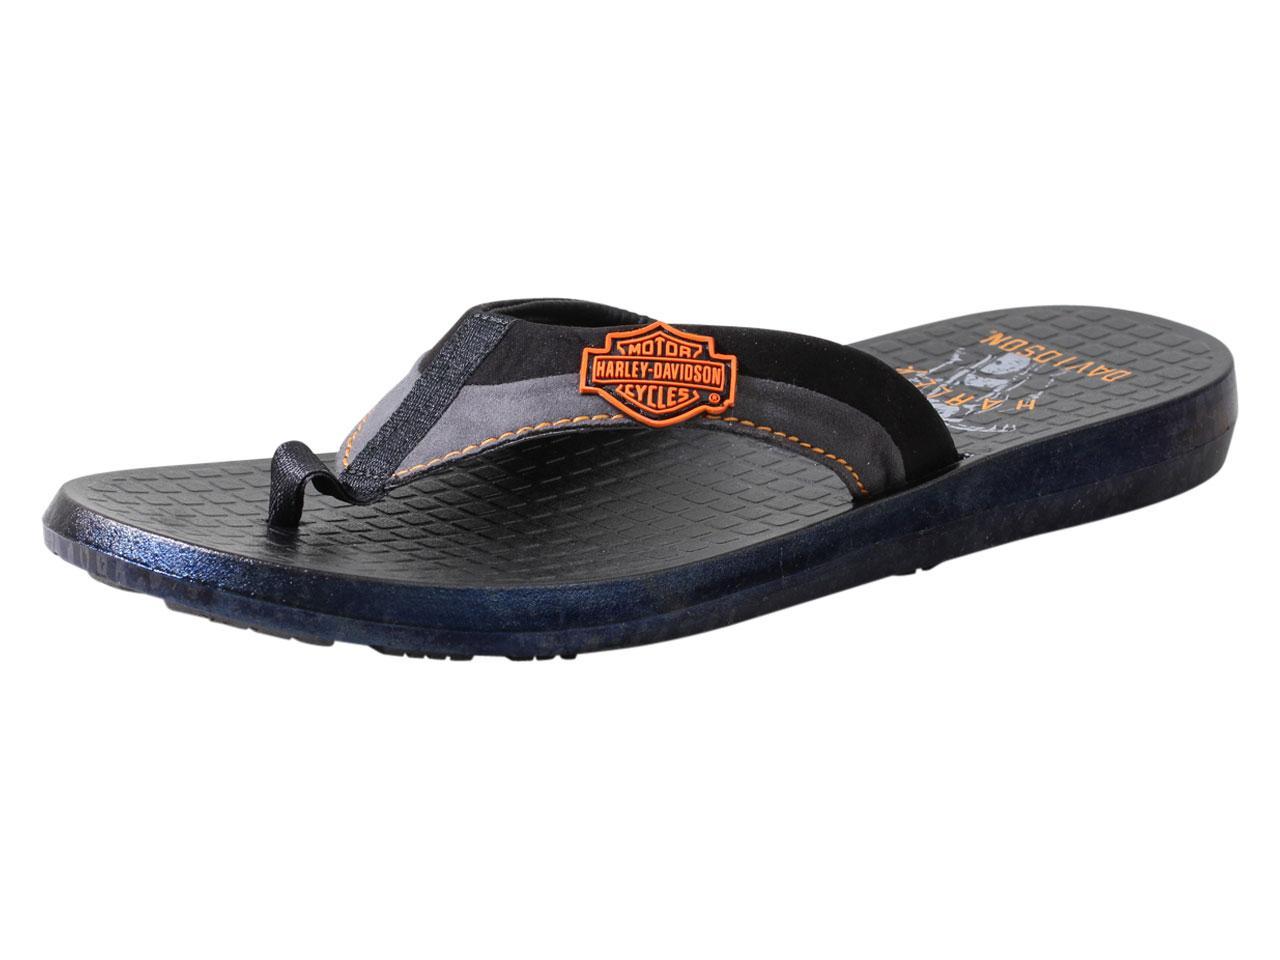 491c13477fbc42 Harley-Davidson Men s Adams Flip Flops Sandals Shoes